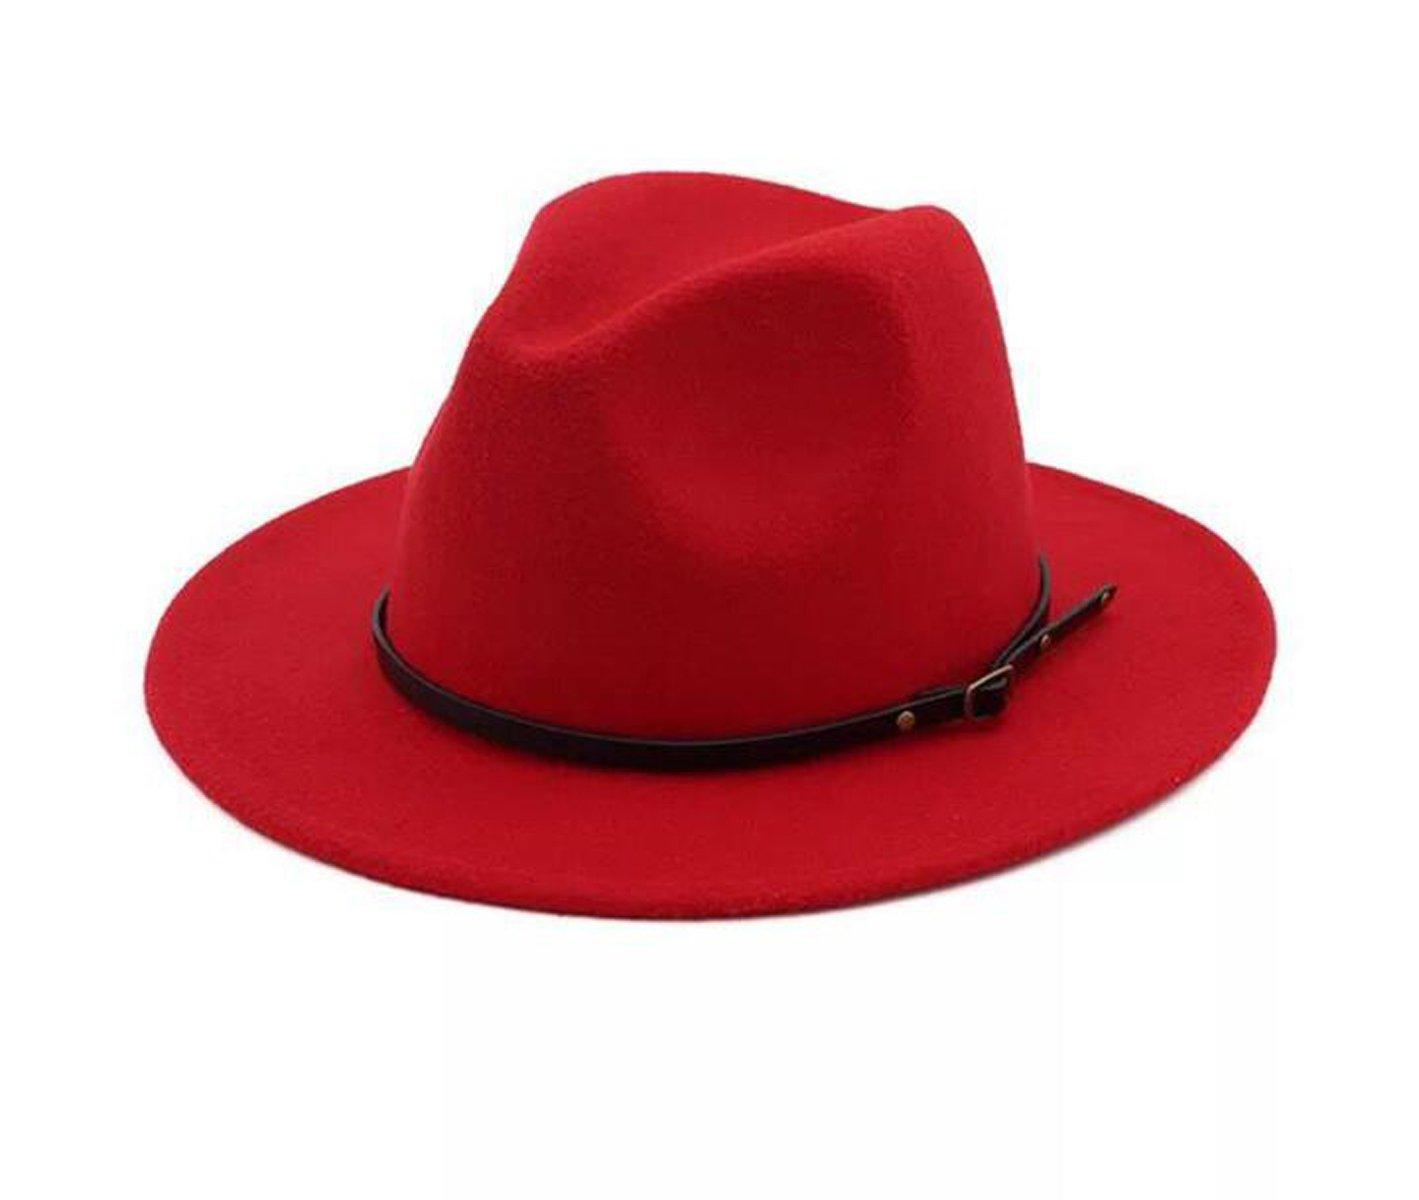 Lanzom Womens Classic Wide Brim Floppy Panama Hat Belt Buckle Wool Fedora Hat Black) woolhat91